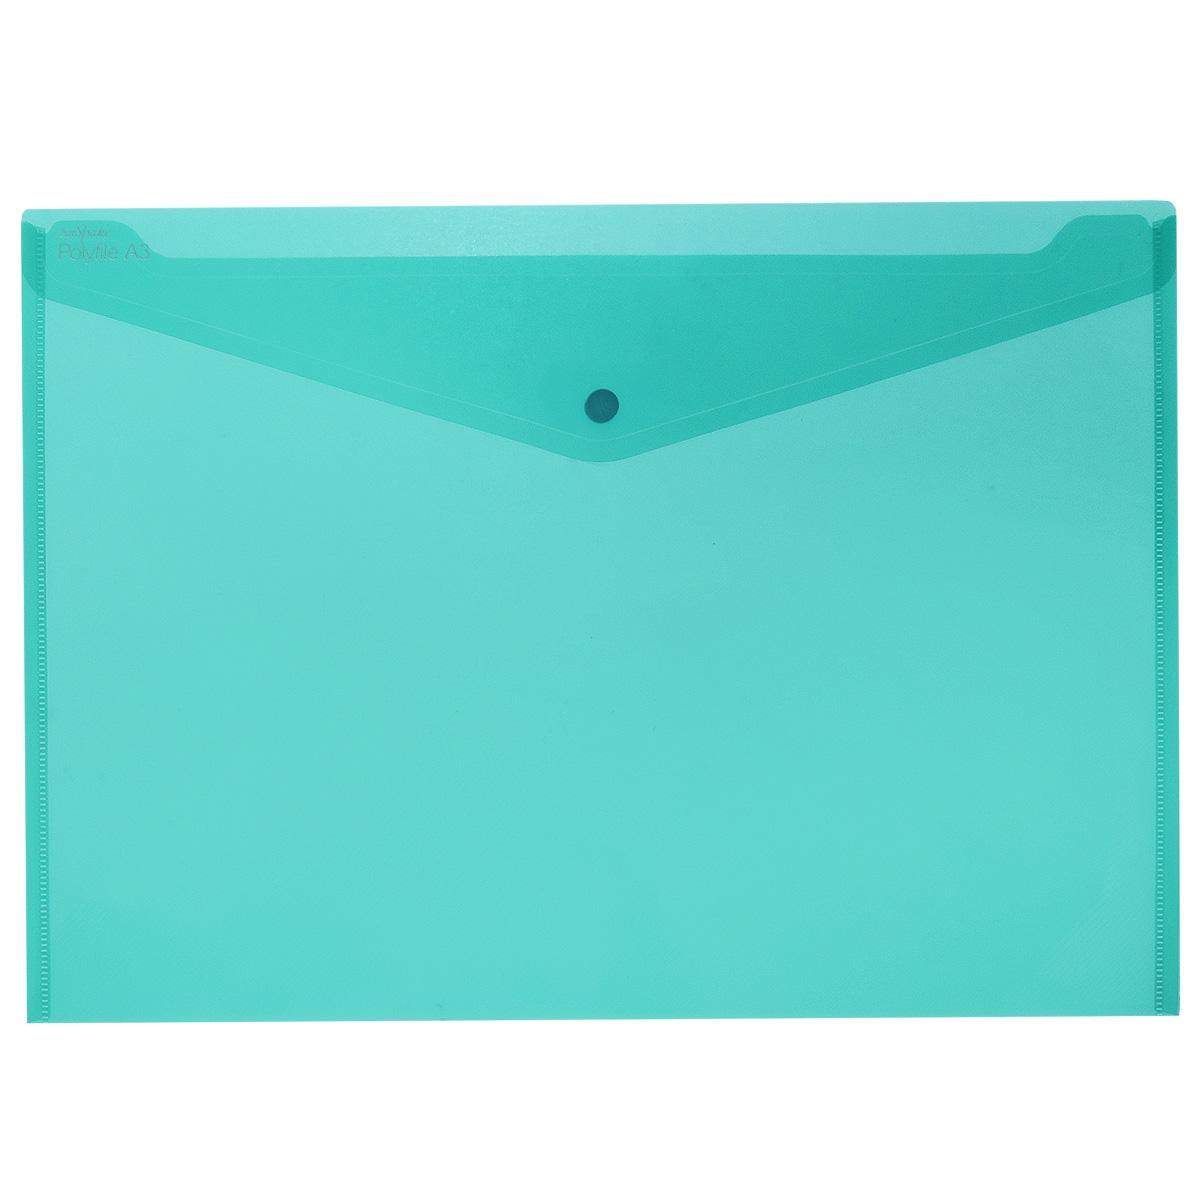 Папка-конверт на кнопке Snopake Polifile: Electra, цвет: бирюзовый, формат А3K11185